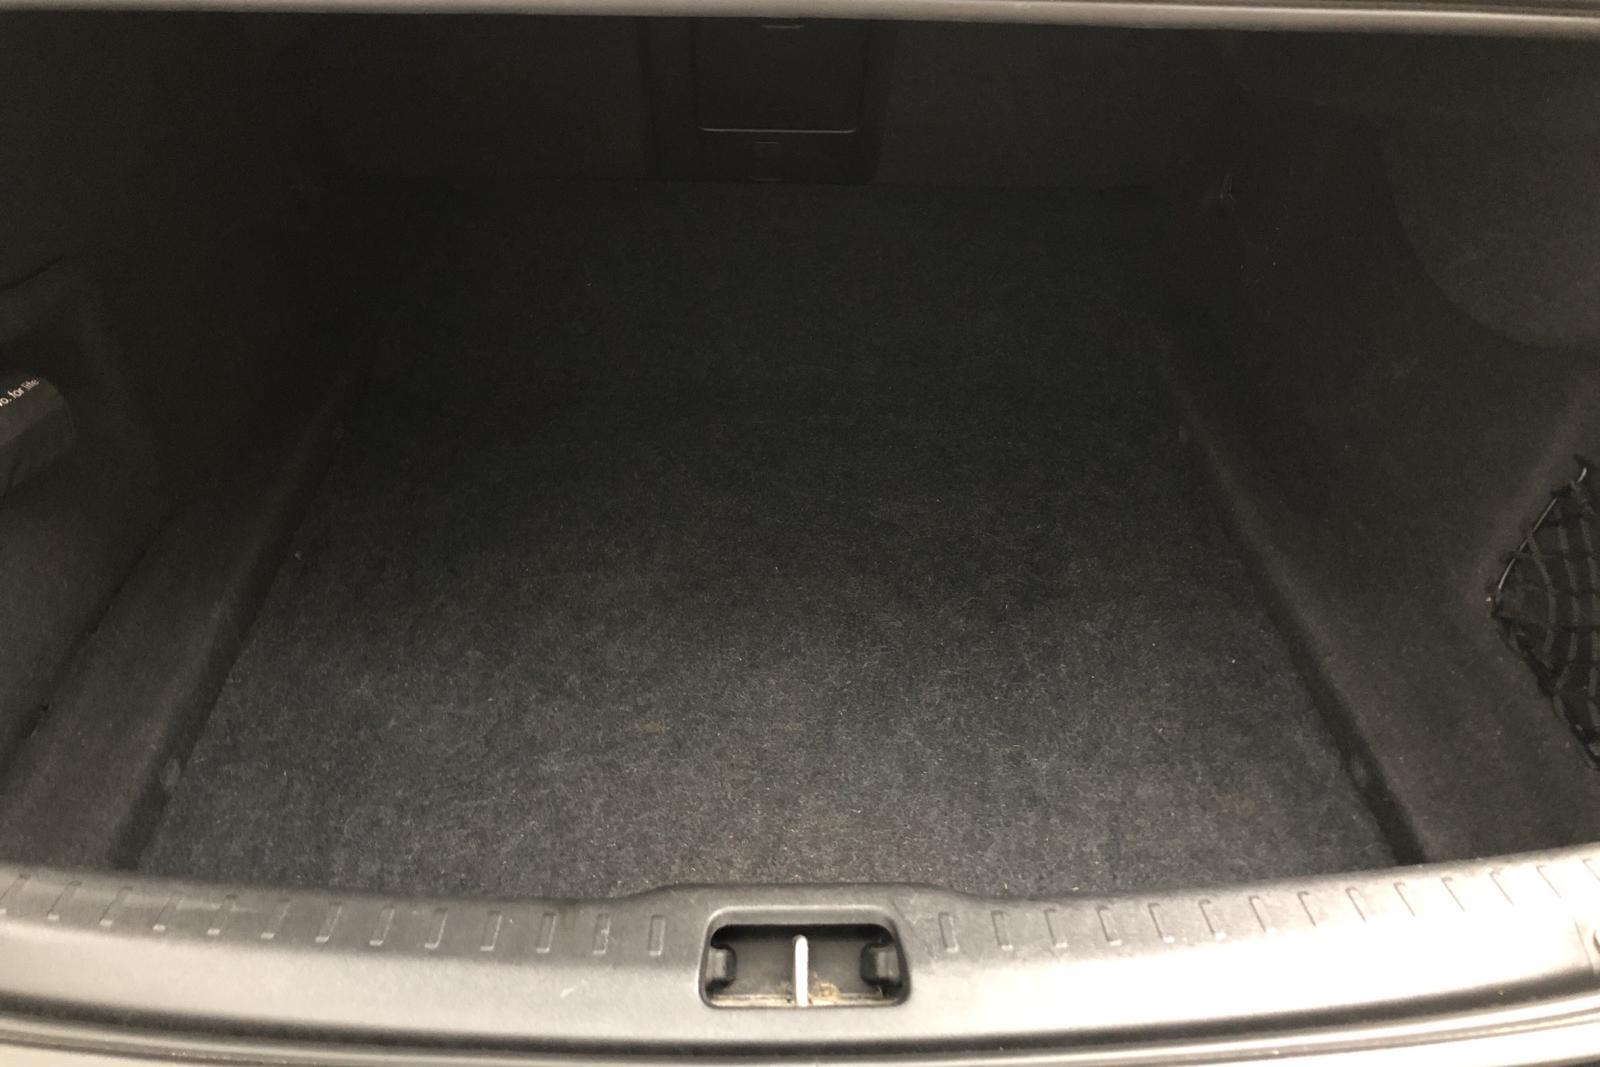 Volvo S90 D4 (190hk) - 92 050 km - Automatic - black - 2018